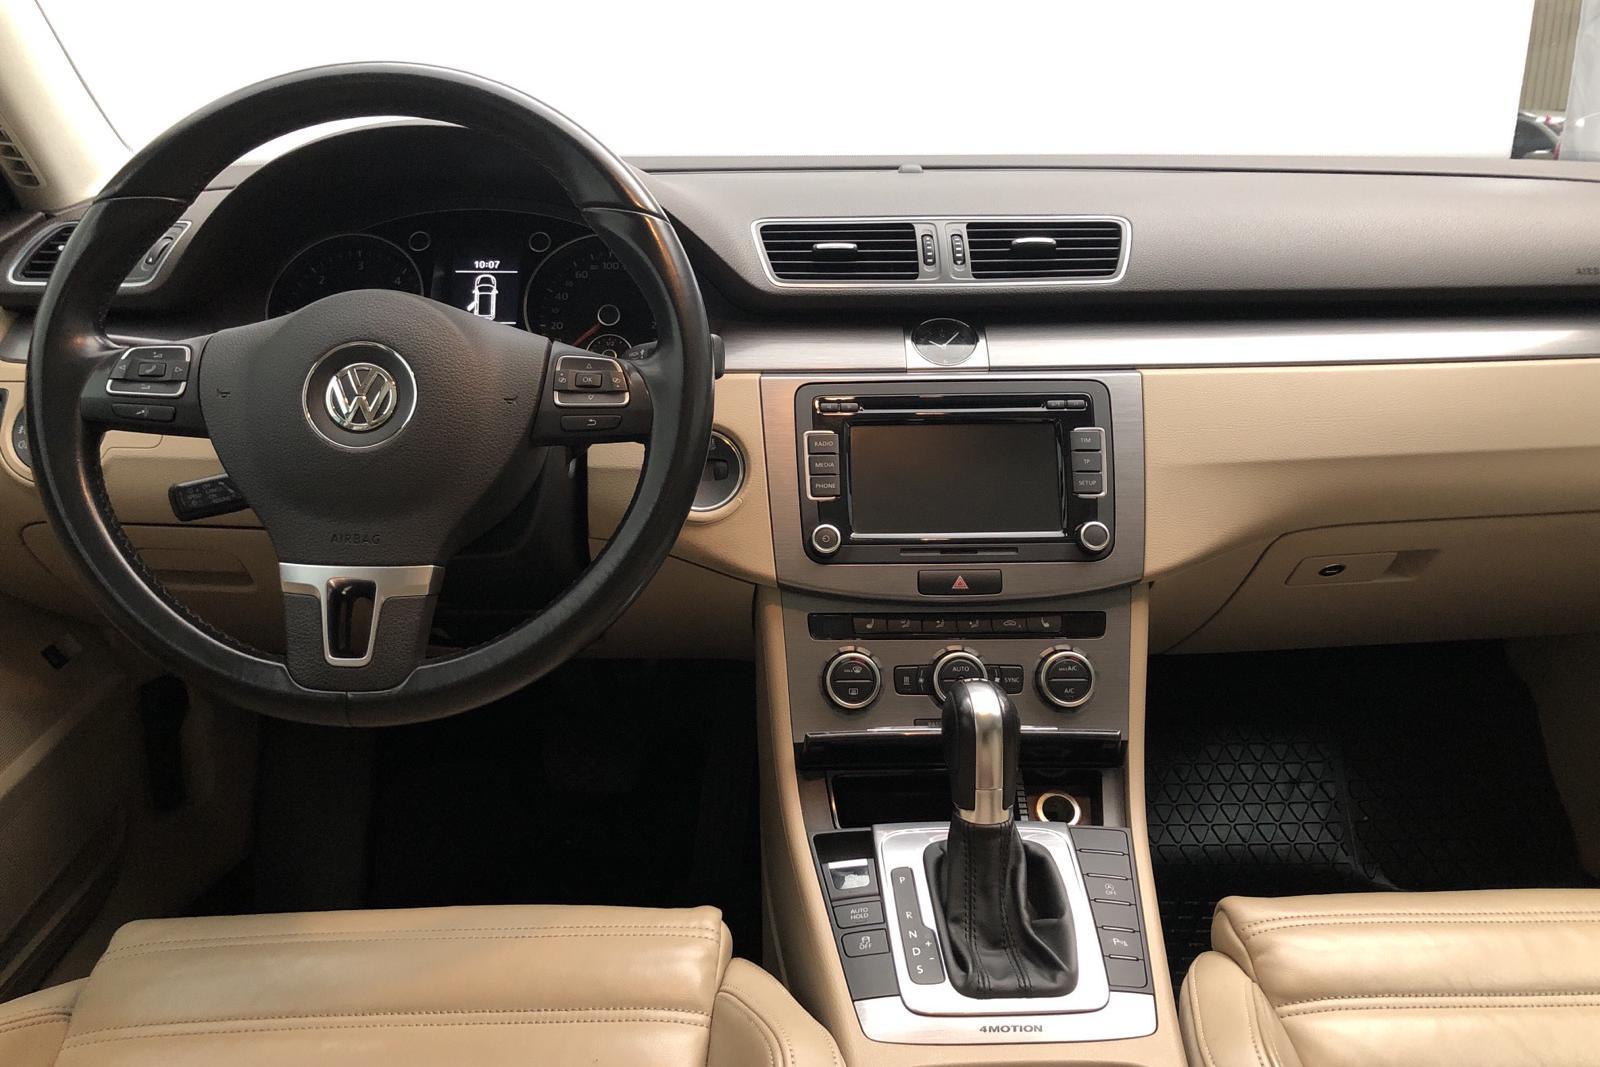 VW Passat 2.0 TDI BlueMotion Technology Variant 4Motion (177hk) - 15 400 mil - Automat - Light Brown - 2014